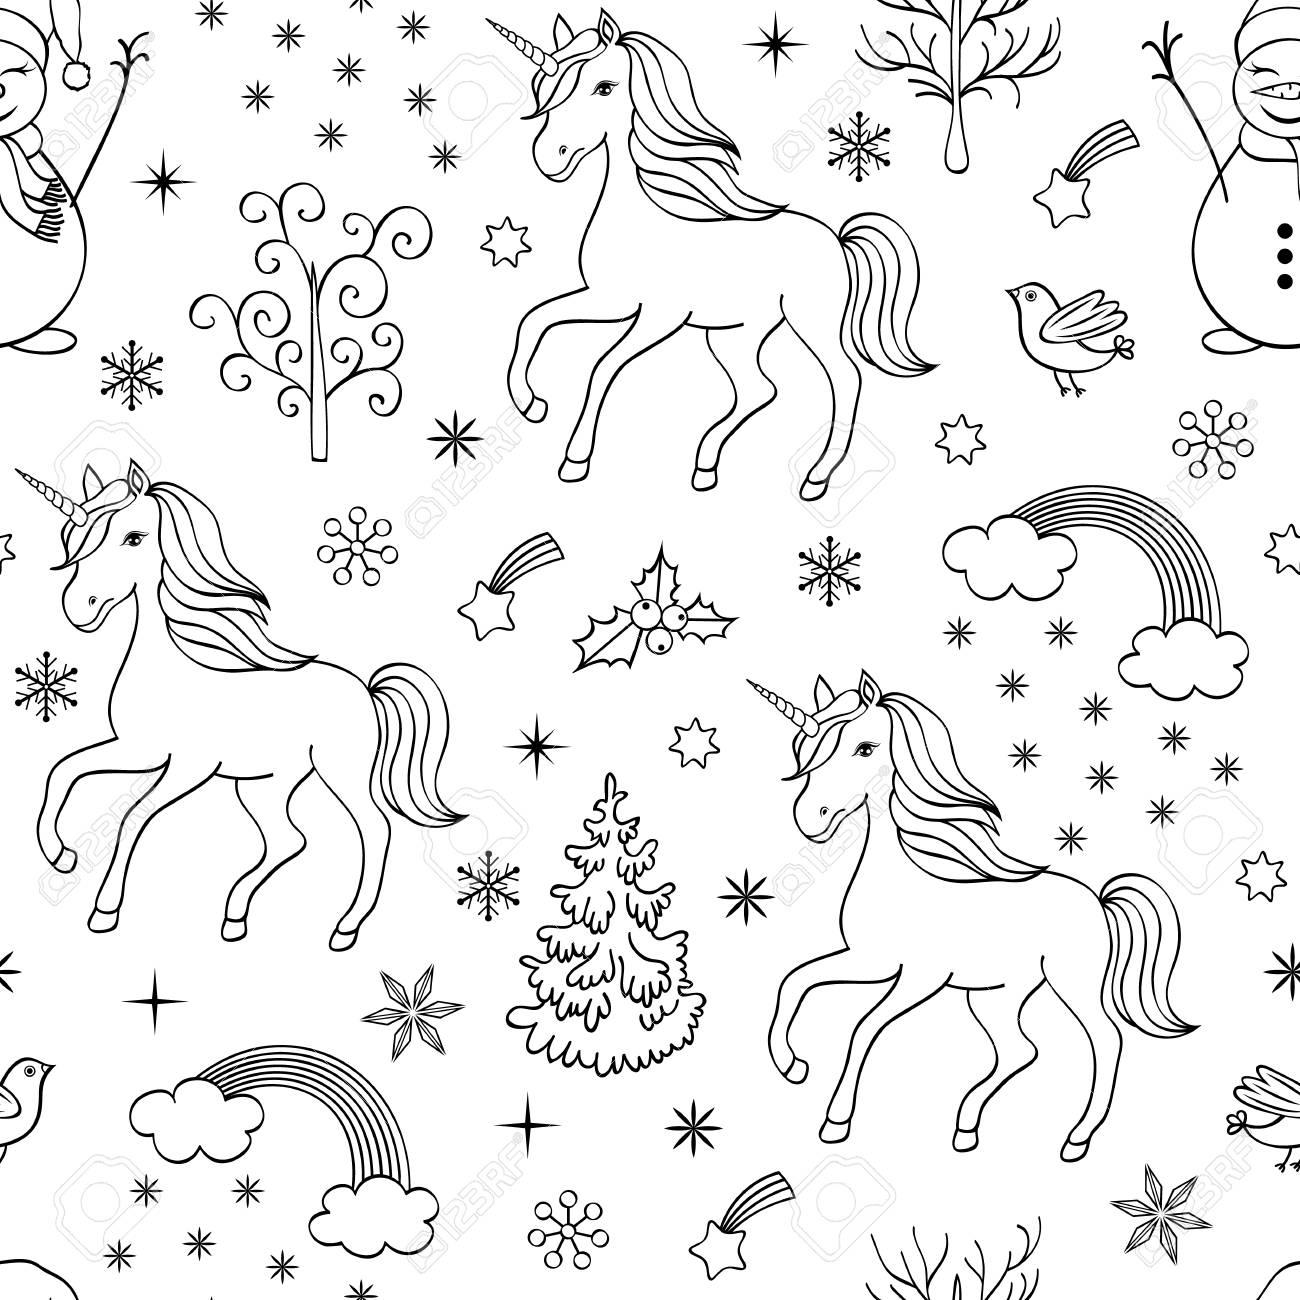 Christmas Seamless Pattern With Unicornstreesbirdssnowmen On White Backgroundcoloring